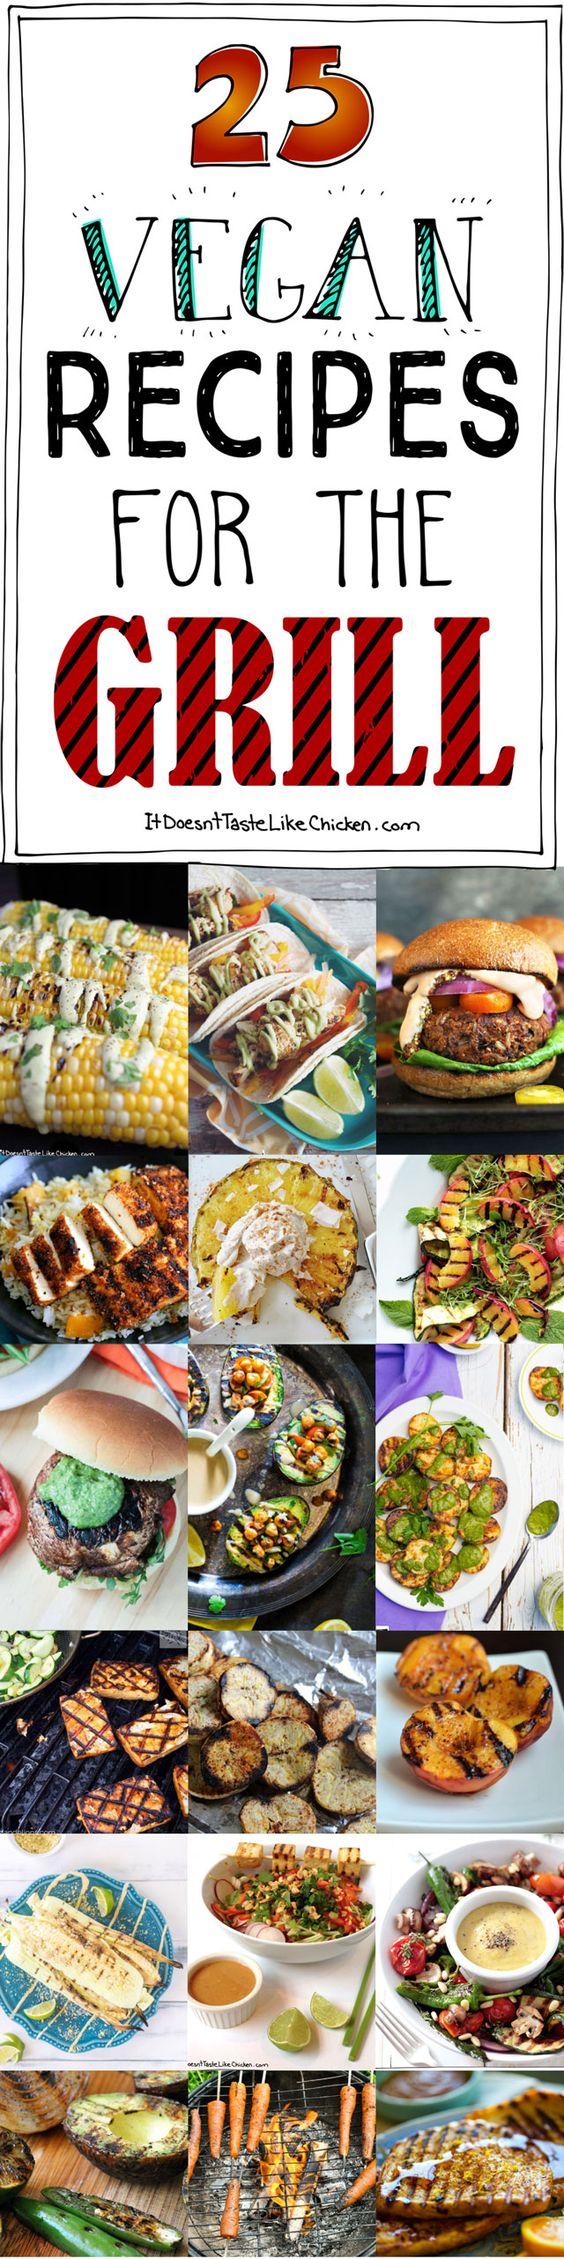 25 Vegan Recipes for the Grill  #vegan #grillen Entdeckt von www.vegaliferocks.de✨ I Fleischlos glücklich, fit & Gesund✨ I Follow me for more inspiration  @ vegaliferocks